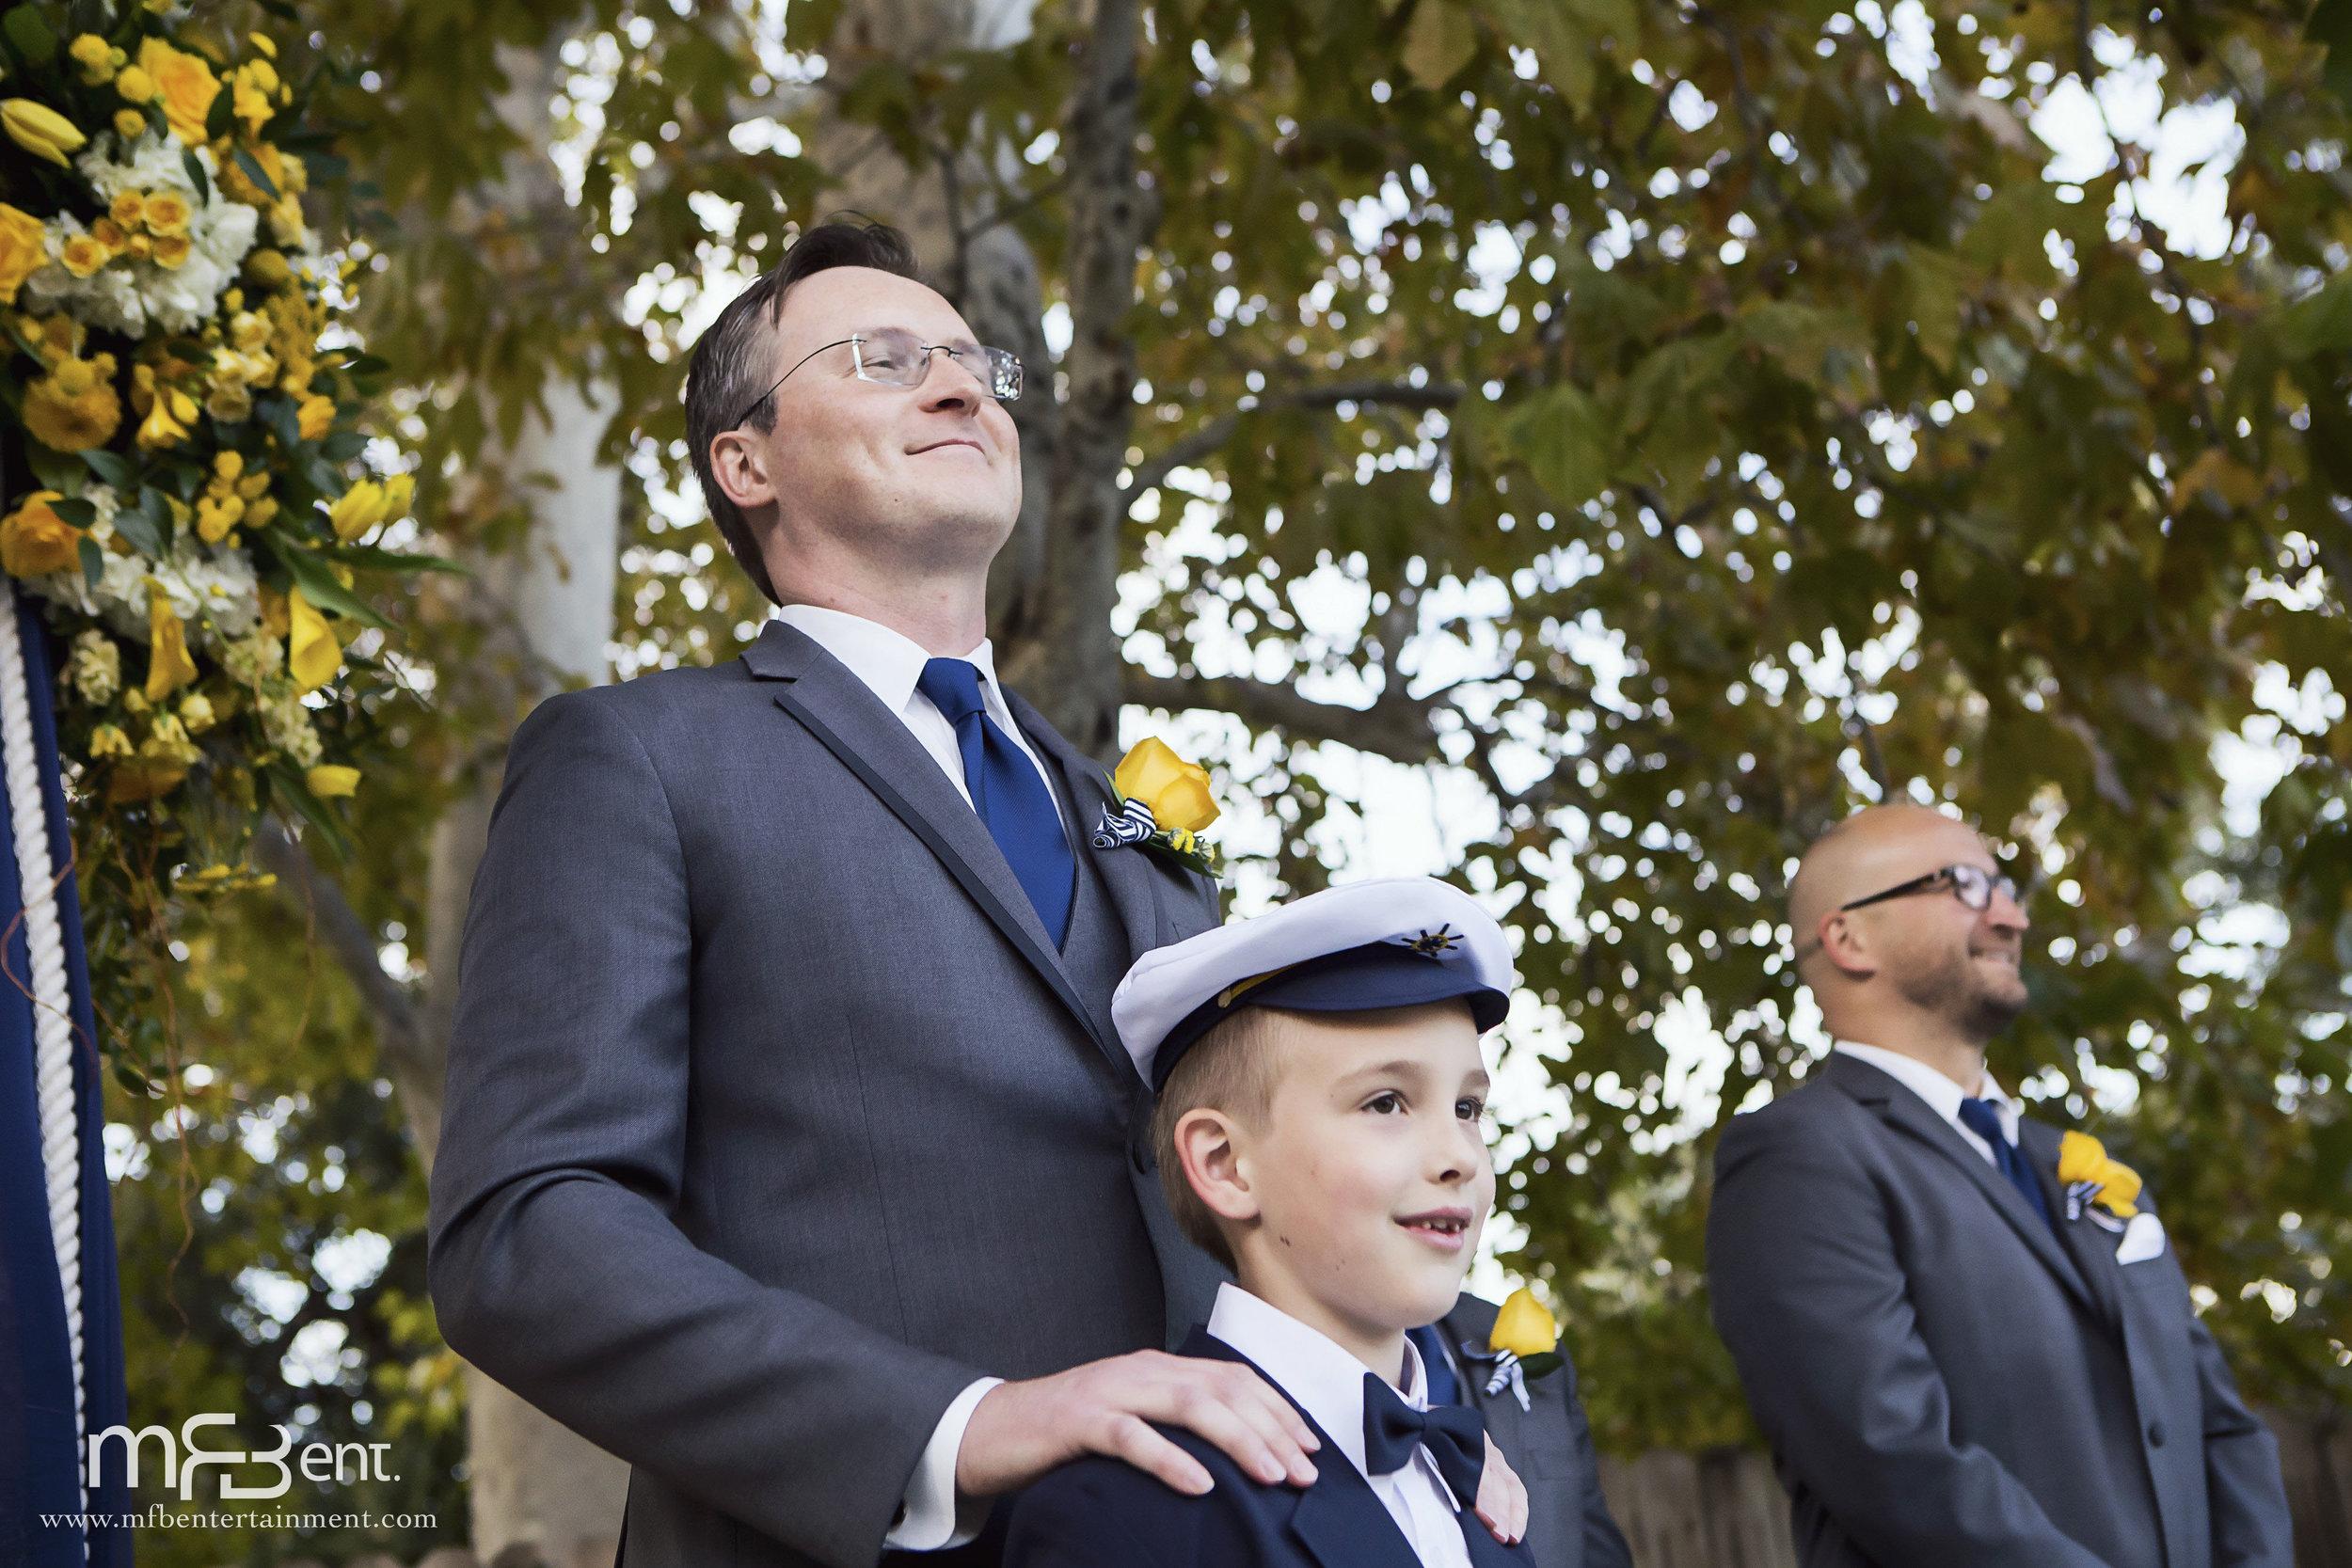 PIOTR CHELSEA WEDDING-CEREMONY-0048 L.jpg